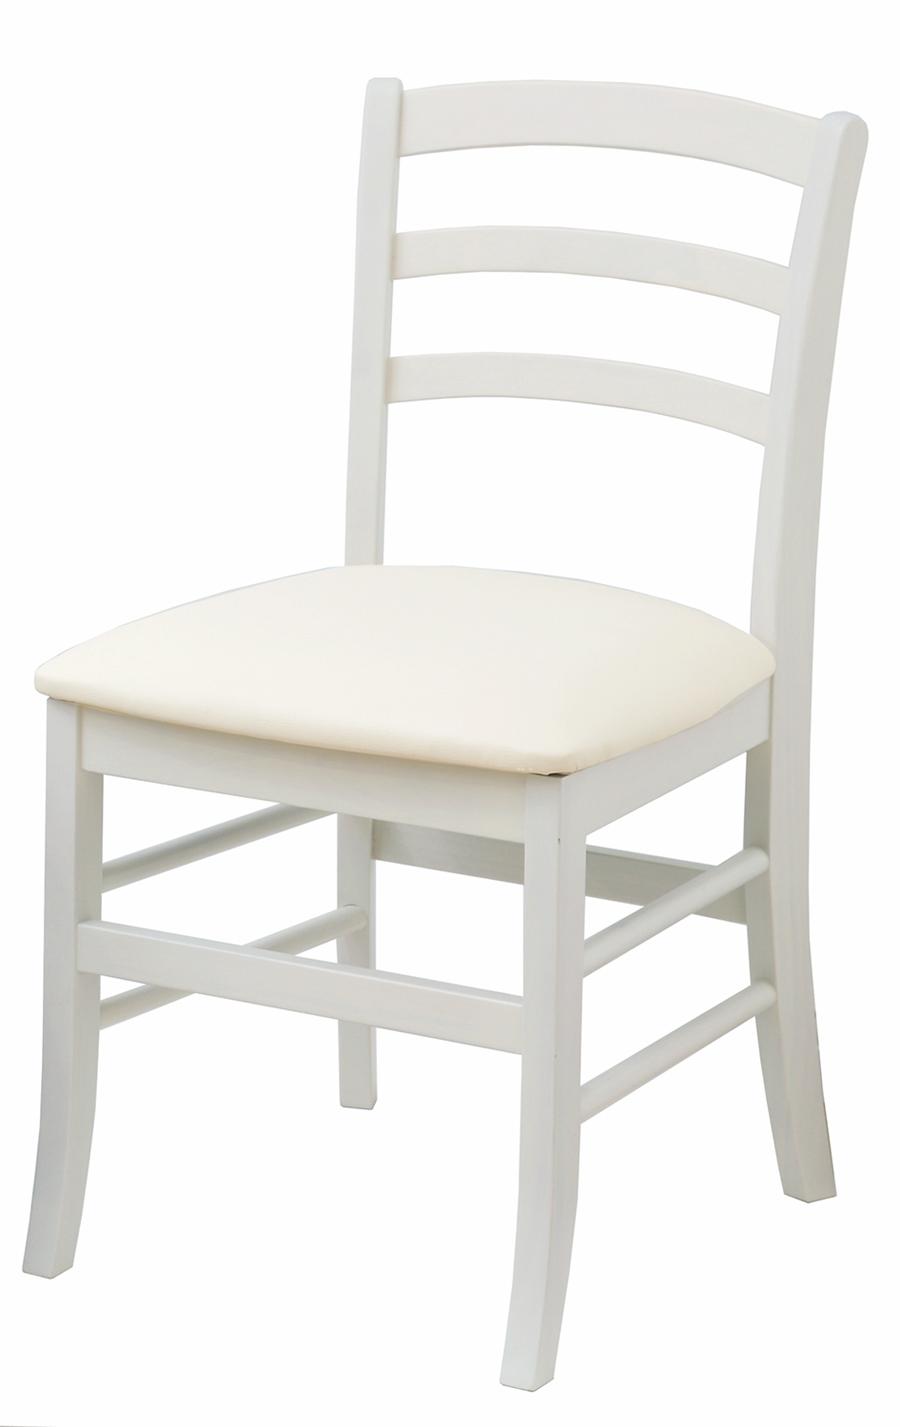 ine reno chair WH 値引き ホワイト 卸売り vary